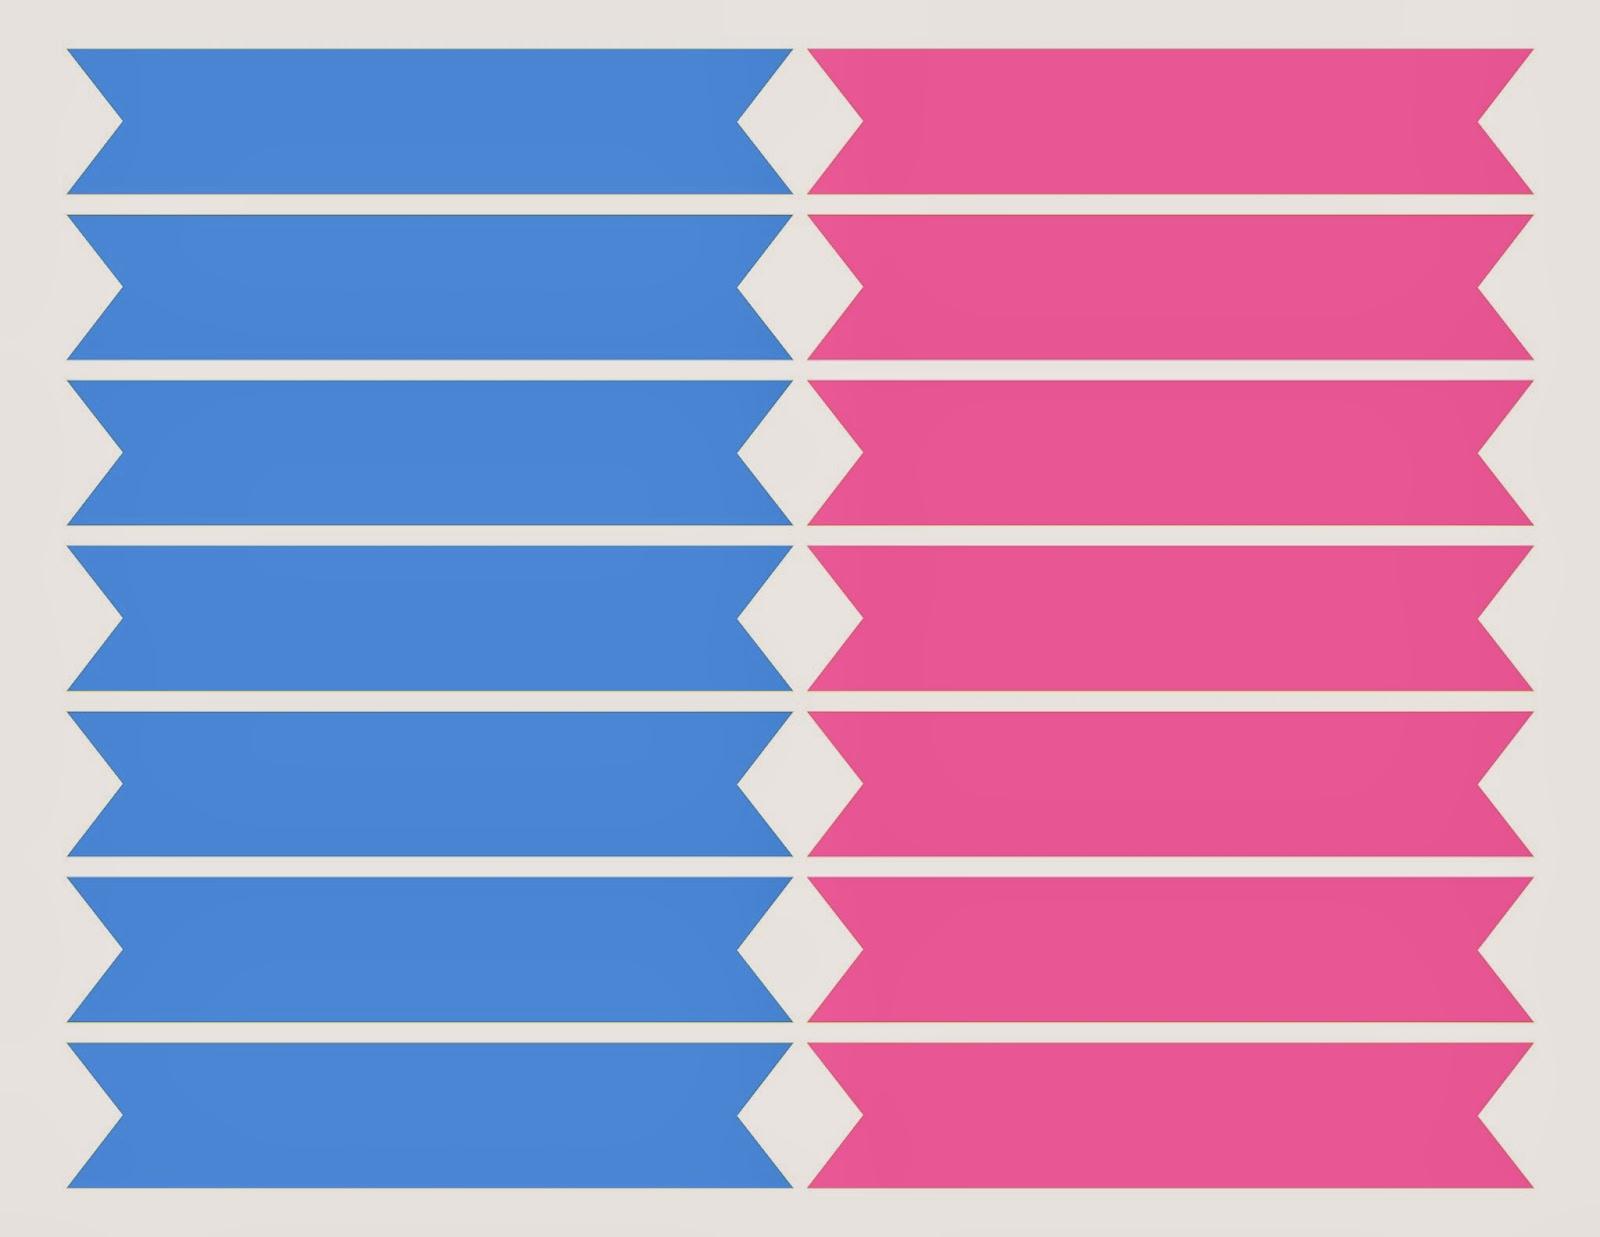 pamela renee designs  elegant cinderella inspired party printables and free coordinating straw flags